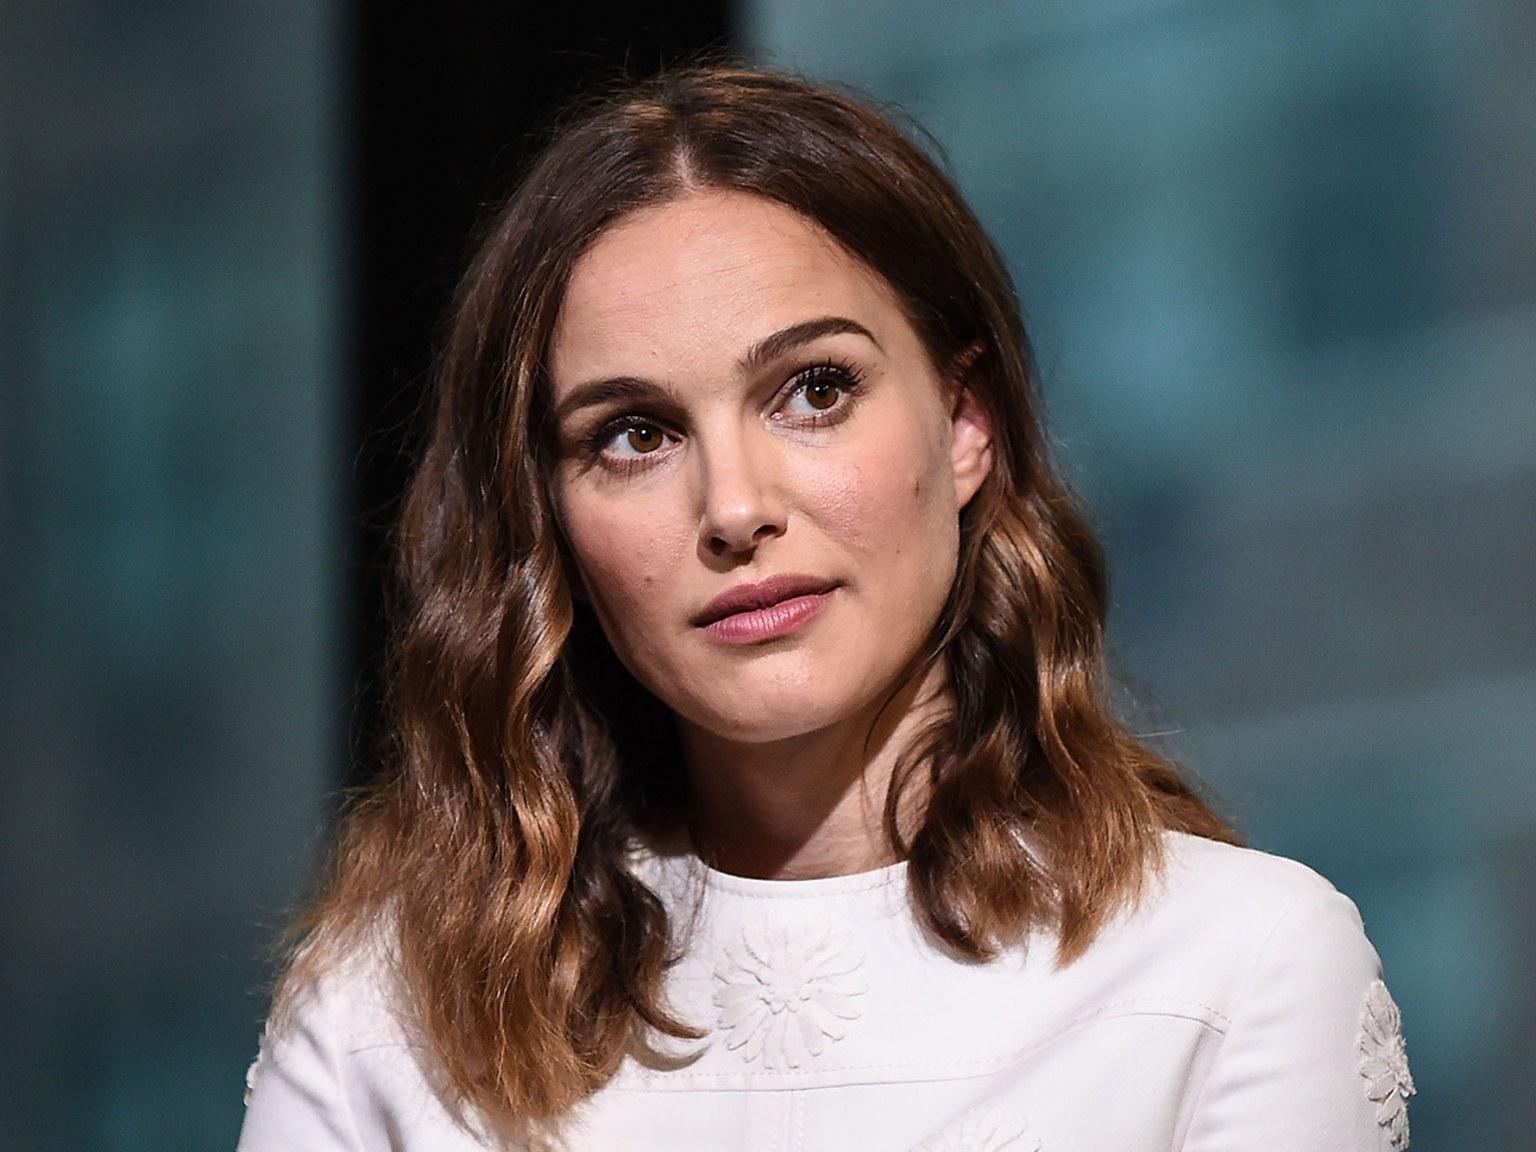 Natalie Portman: Αρνείται να δεχθεί βραβείο από το Ισραήλ